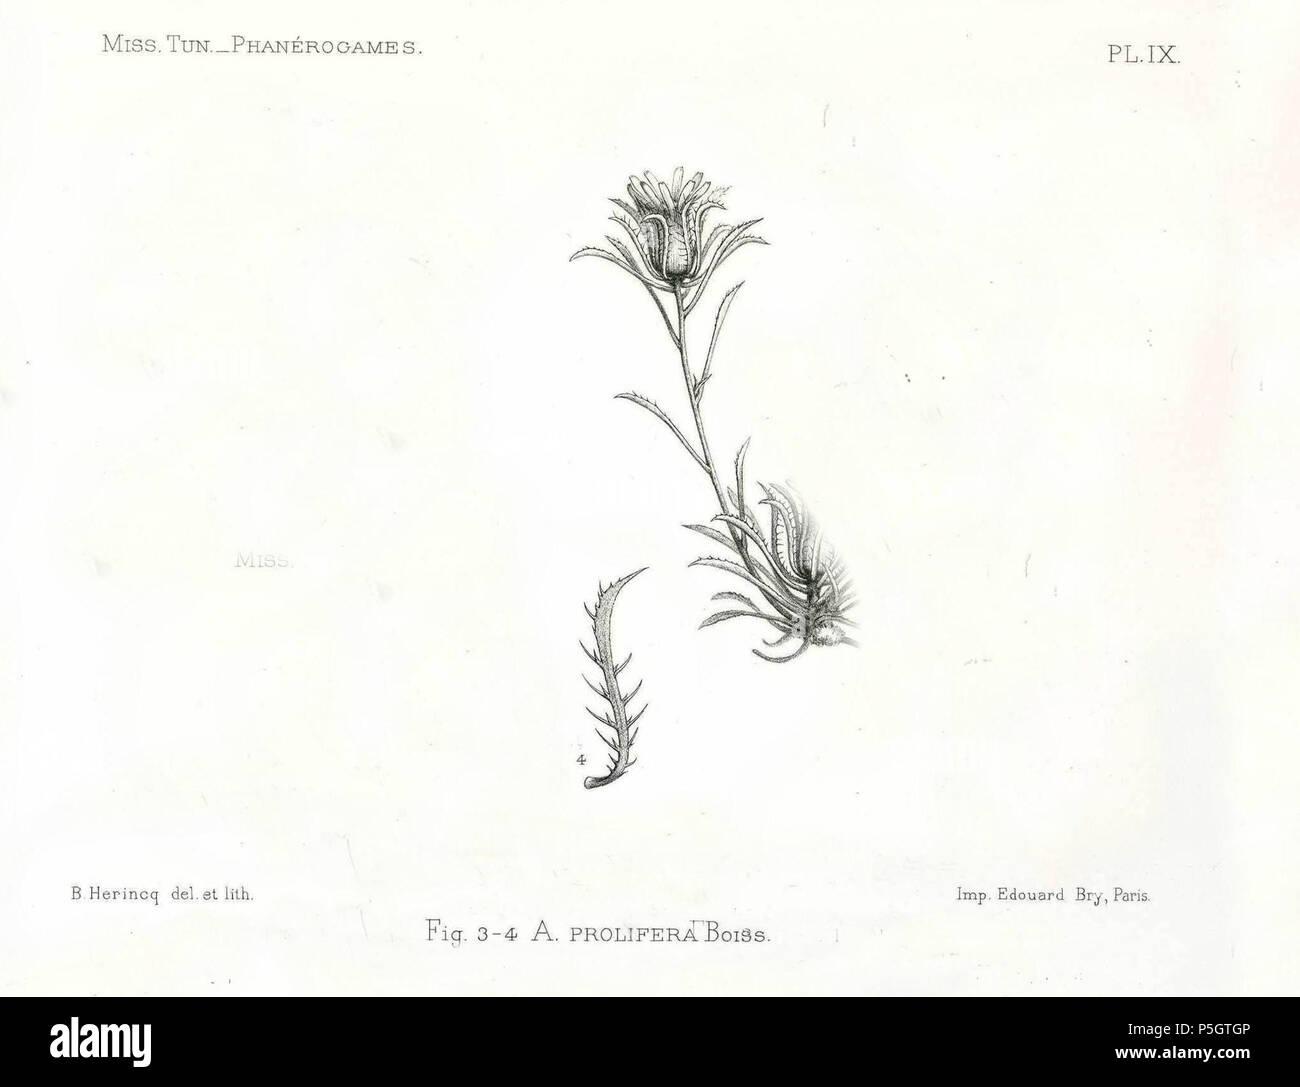 002 21 Stock Photos Images Alamy Senter Led N A Espaol Ilustracin De Atractylis Prolifera 1895 Uploaded 2013